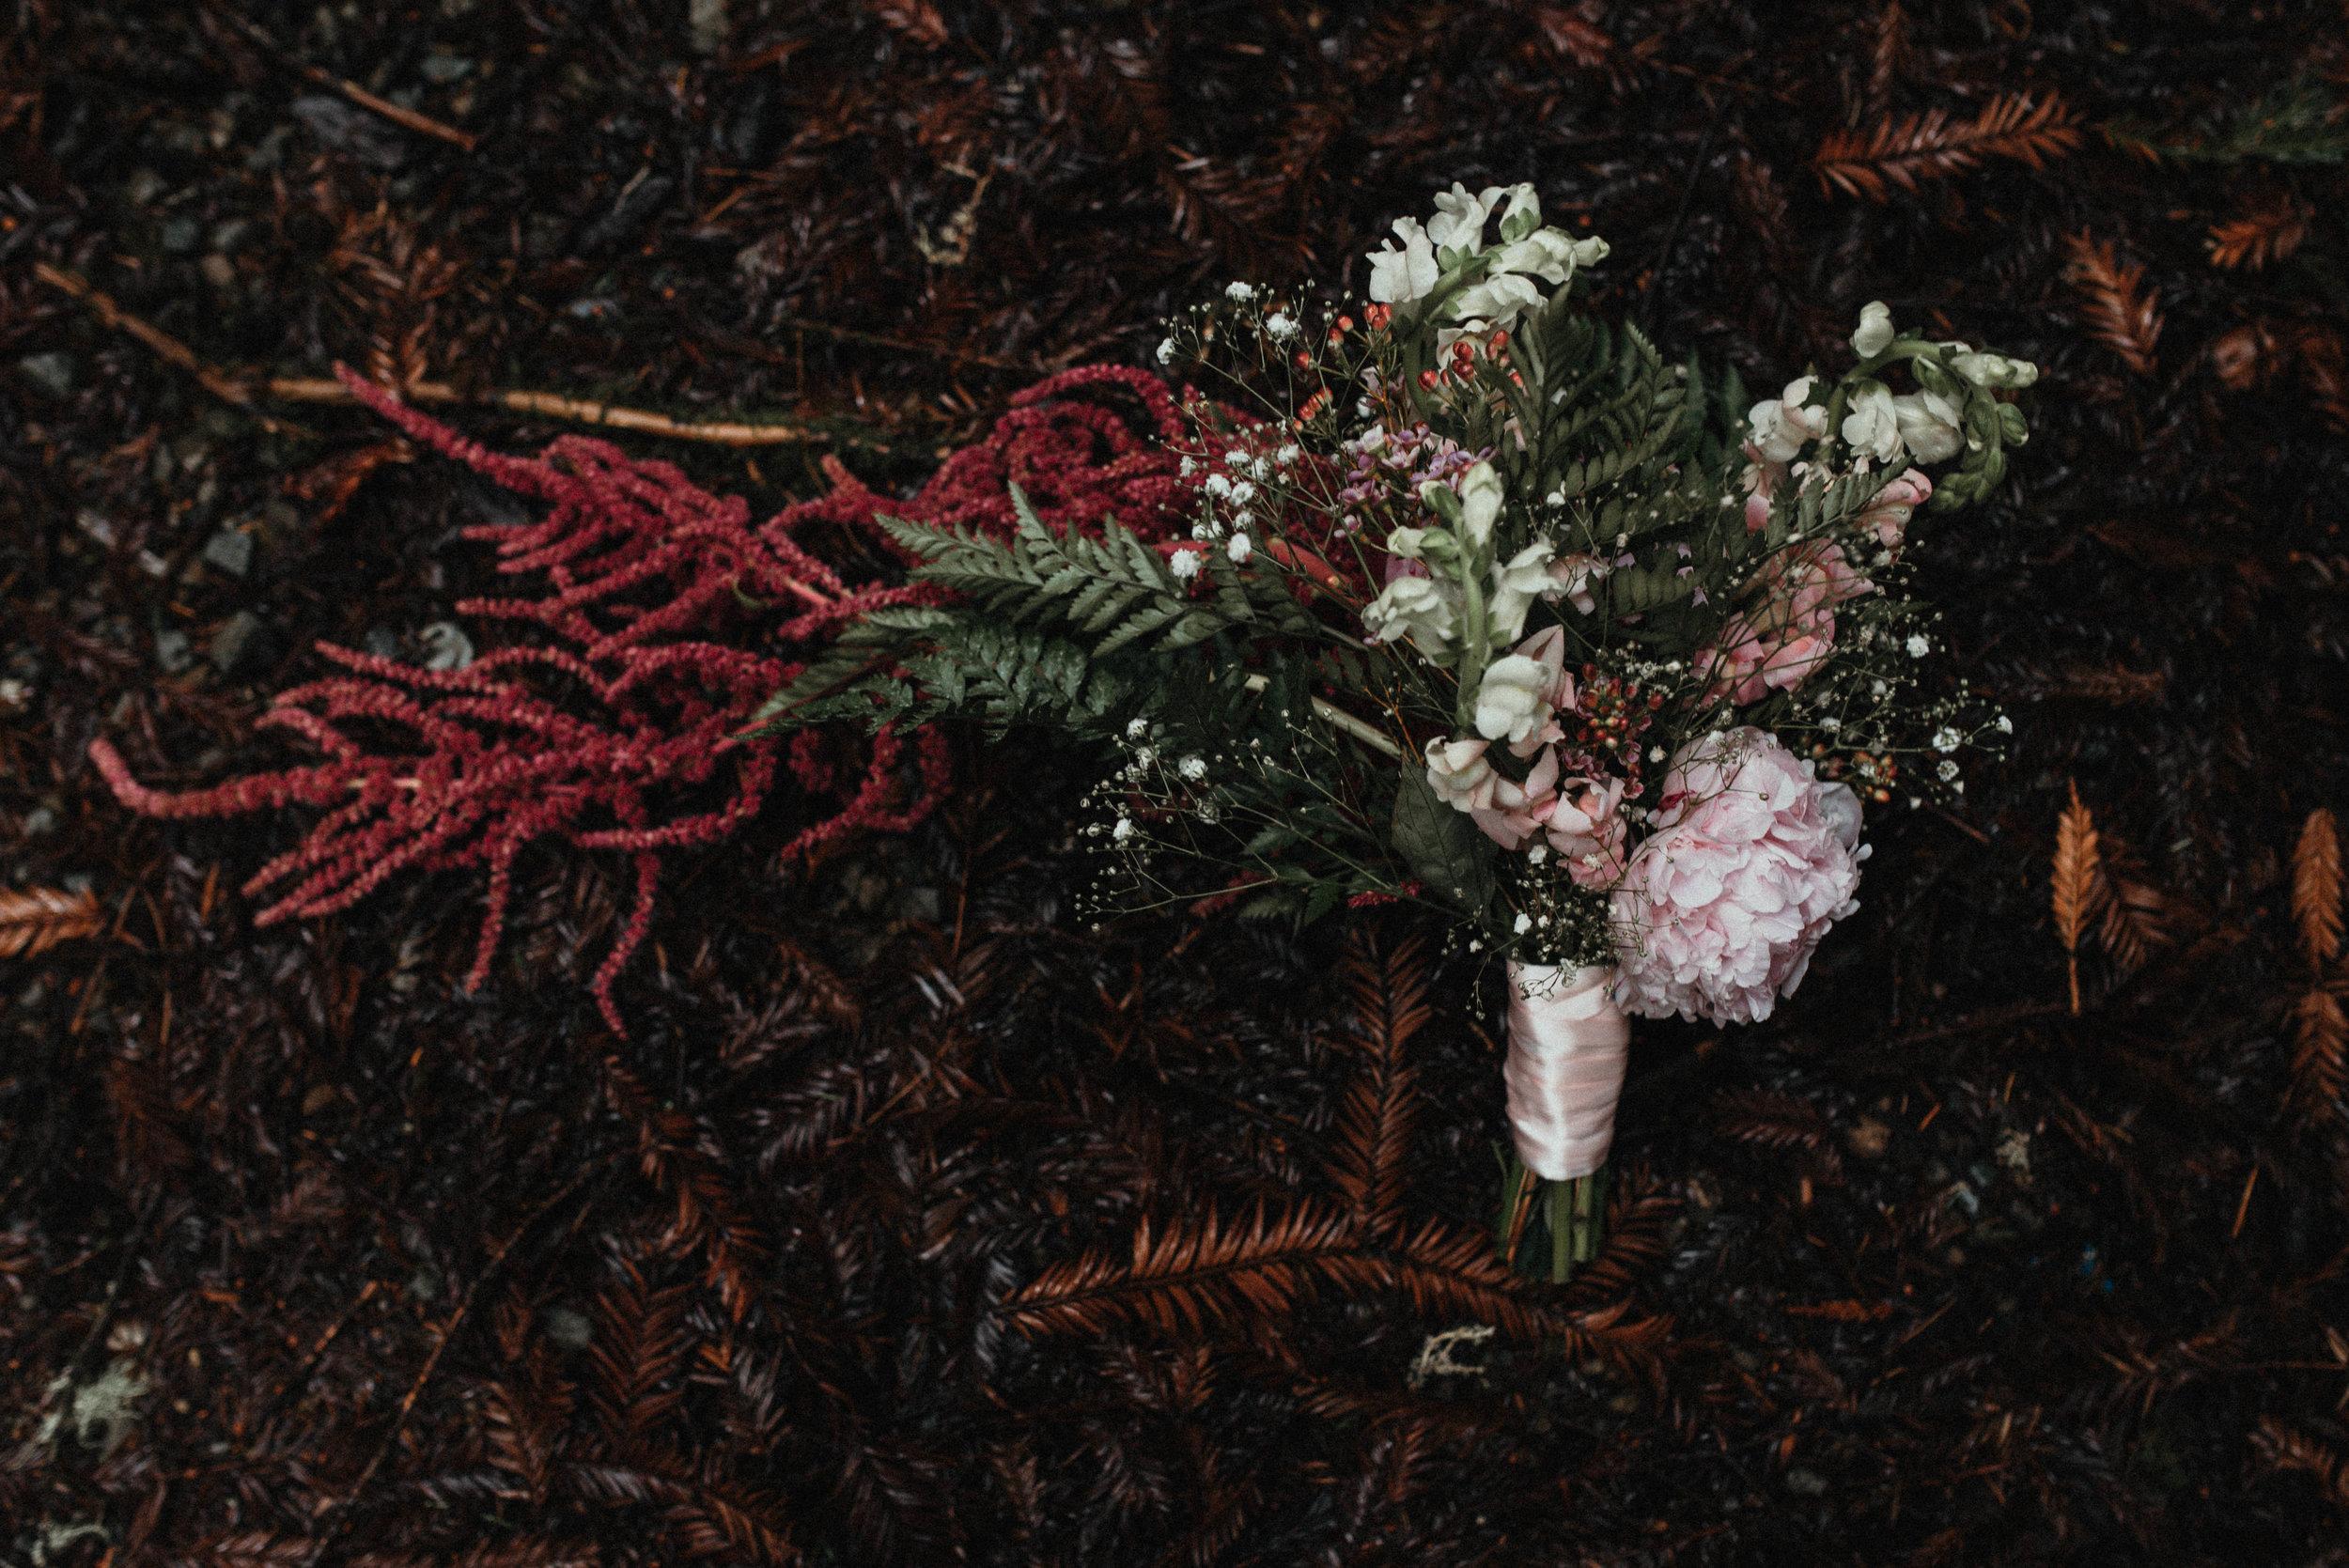 Intimiate Redwoods Elopement , Elopement Inspiration, Jessica Heron Images, Northern California Elopement, Oregon Elopement, Oregon Wedding, Elopement Ideas, diy bouquet, fern bouquet